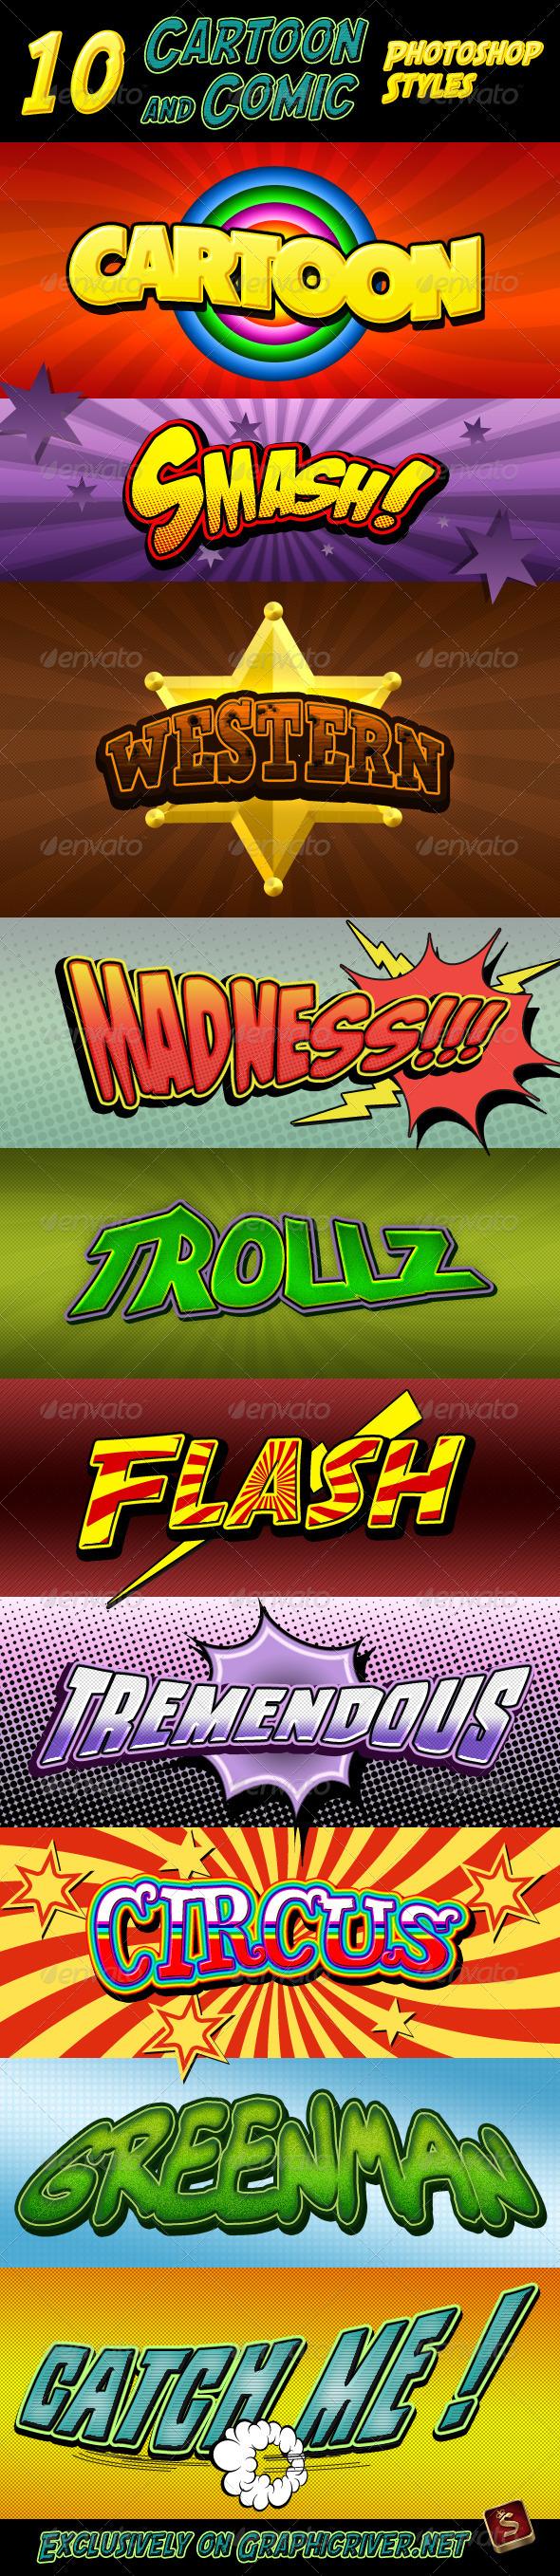 Cartoon And Comic Book Styles